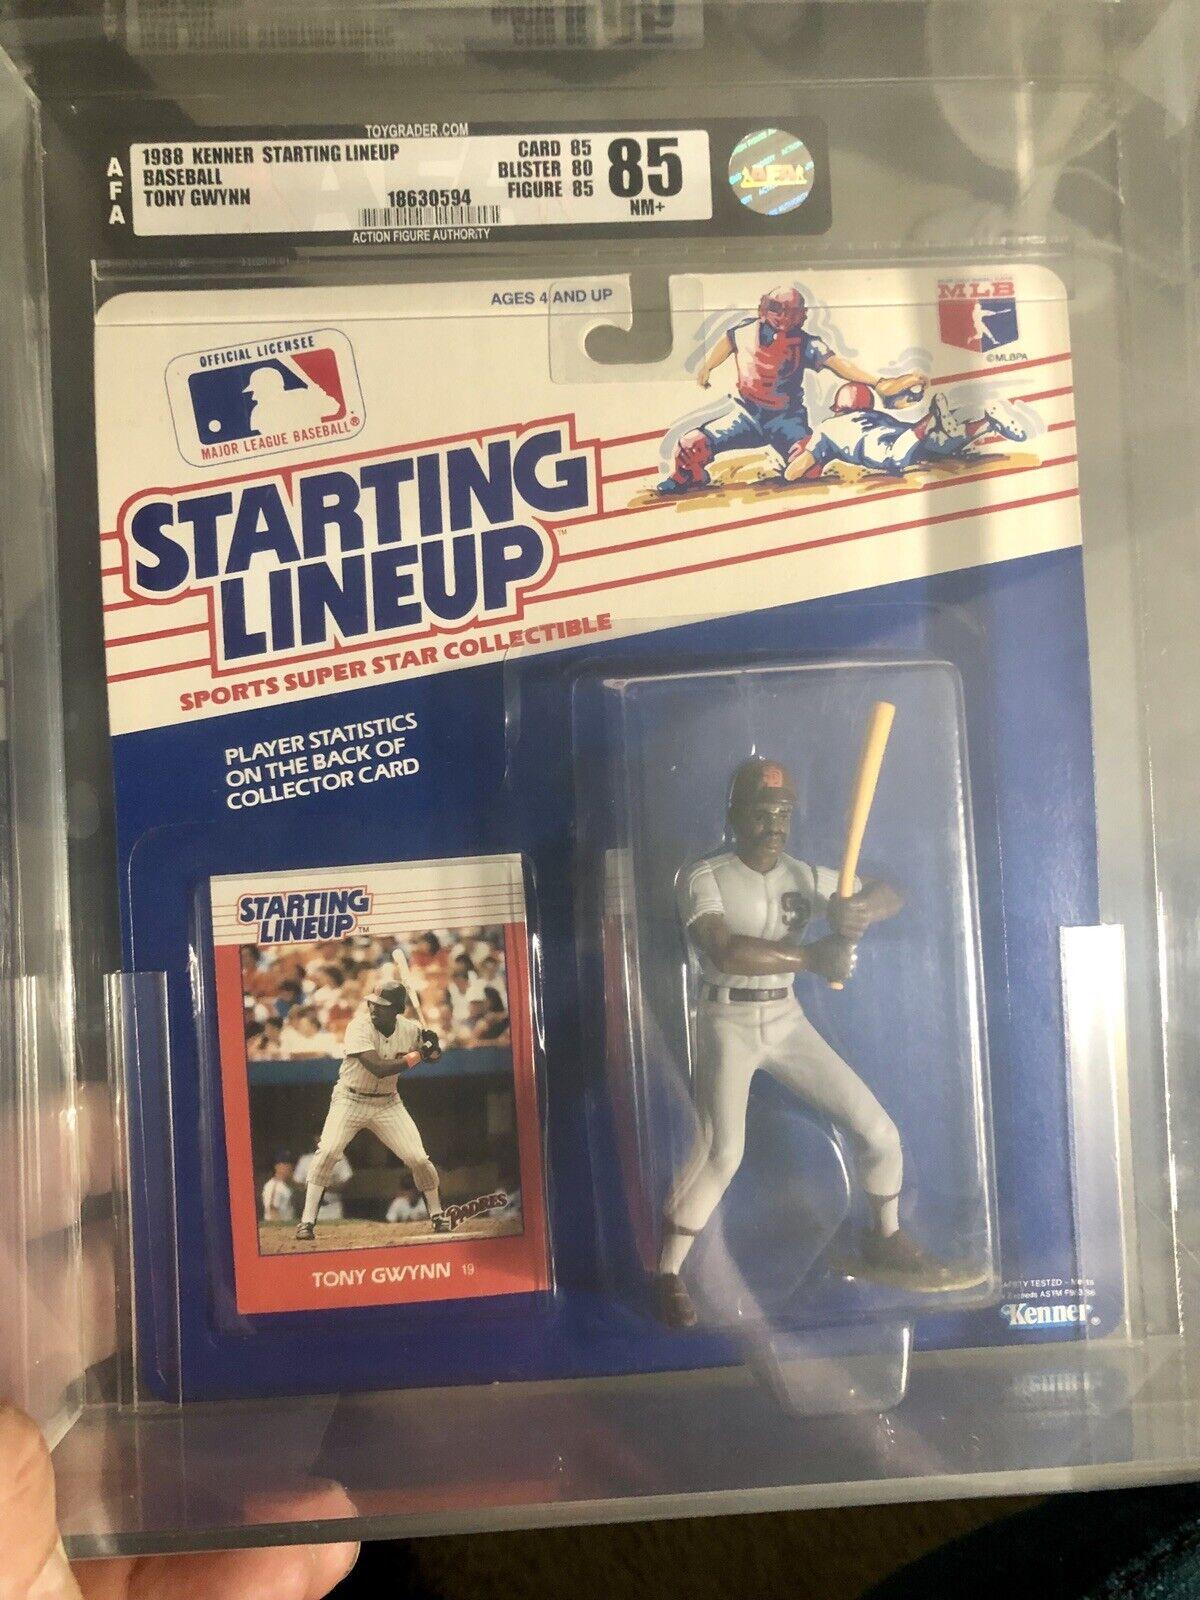 1988 Tony Gwynn 1st Edition Kenner Starting Lineup  classés figurine Autorité 85  Line Up  grandes marques vendent pas cher